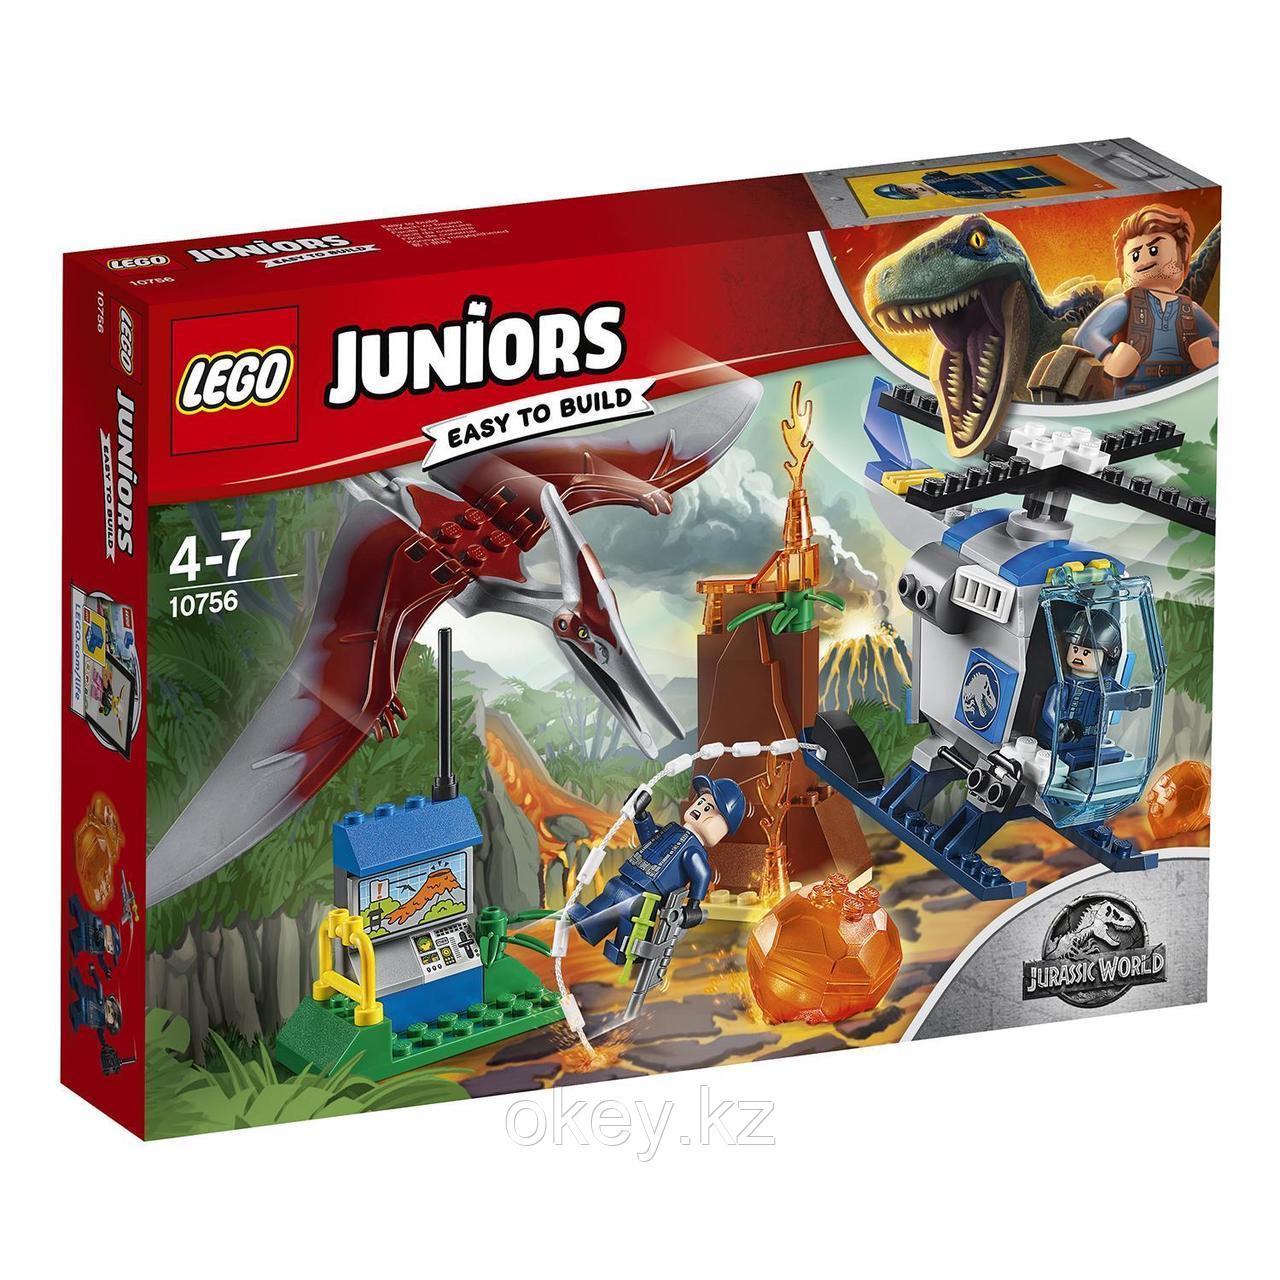 LEGO Juniors: Jurassic World — Побег птеранодона 10756